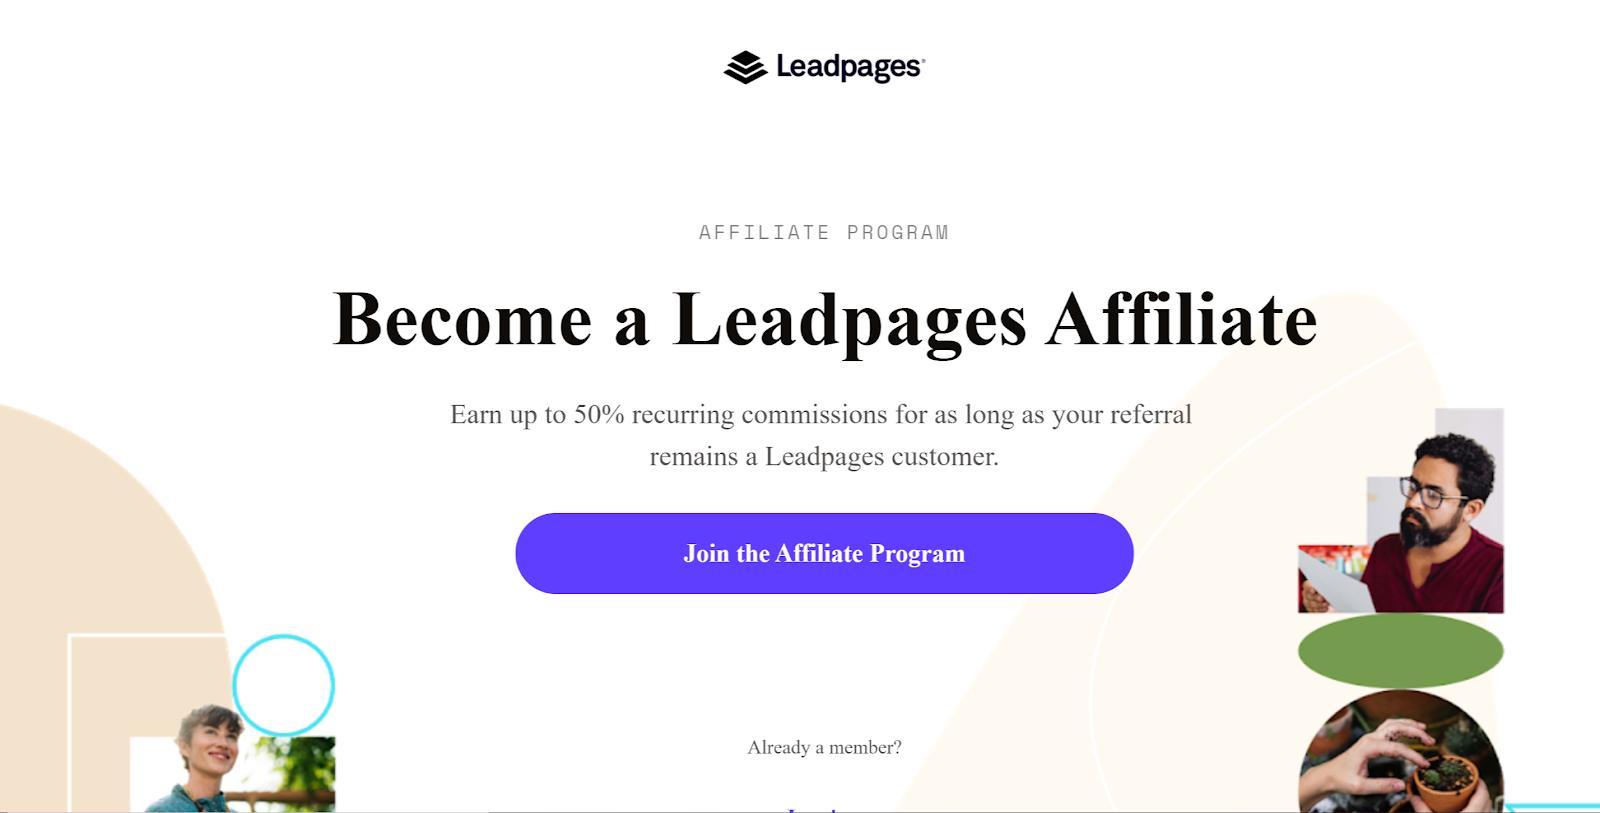 Leadpages passive affiliate income program